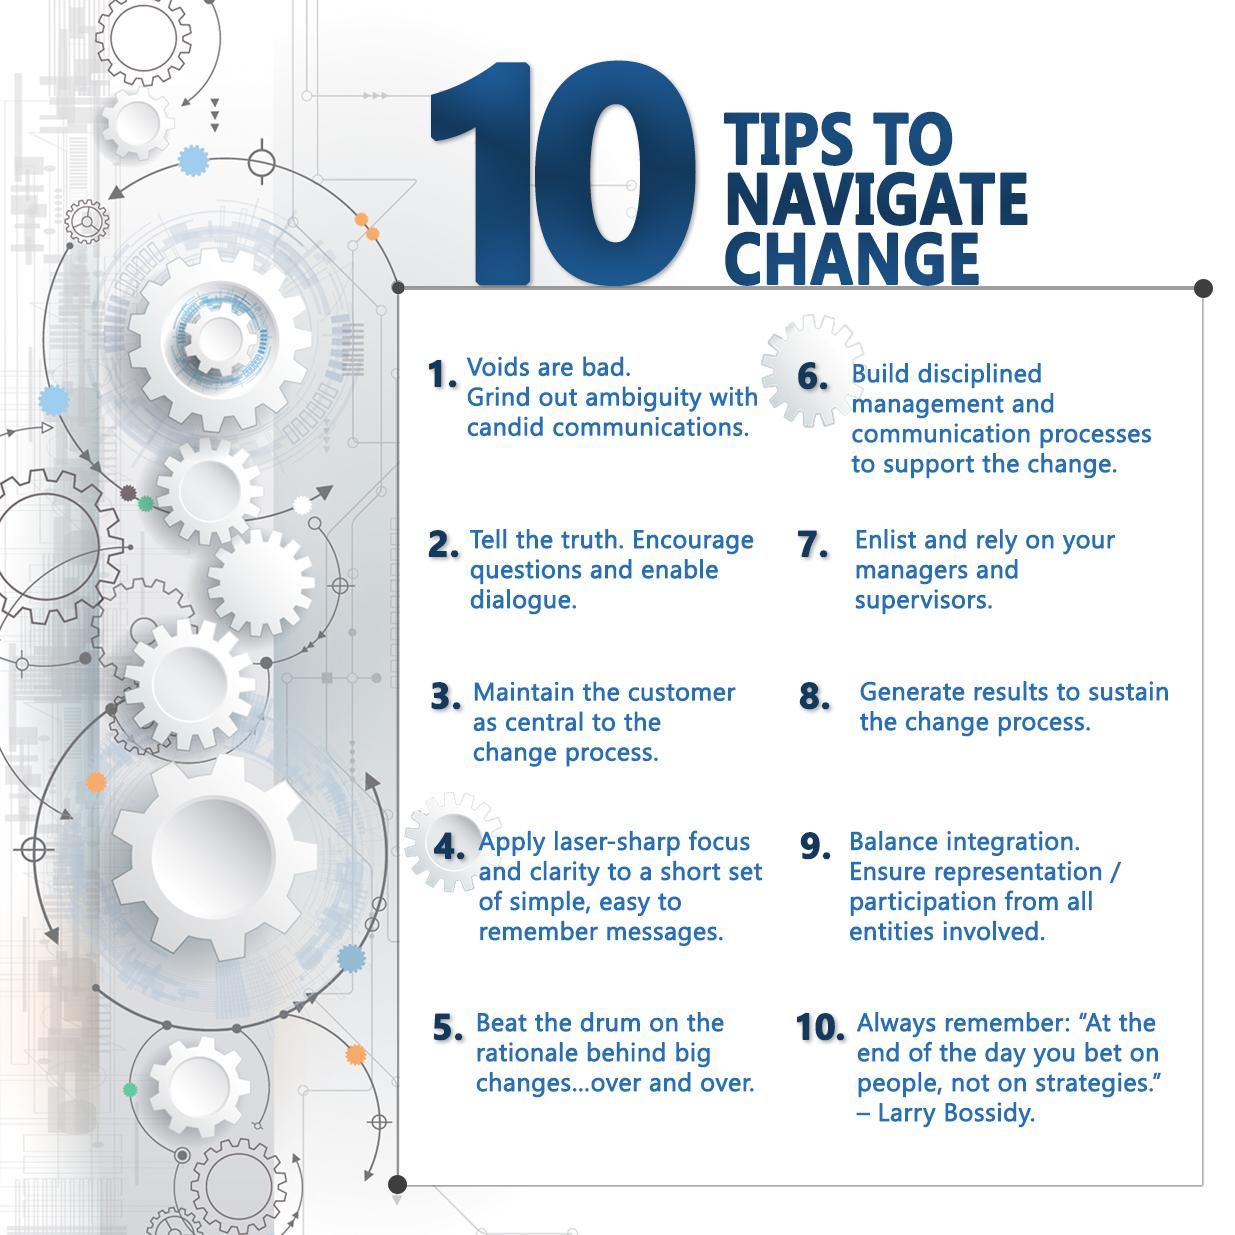 10 Tips to Navigate Change